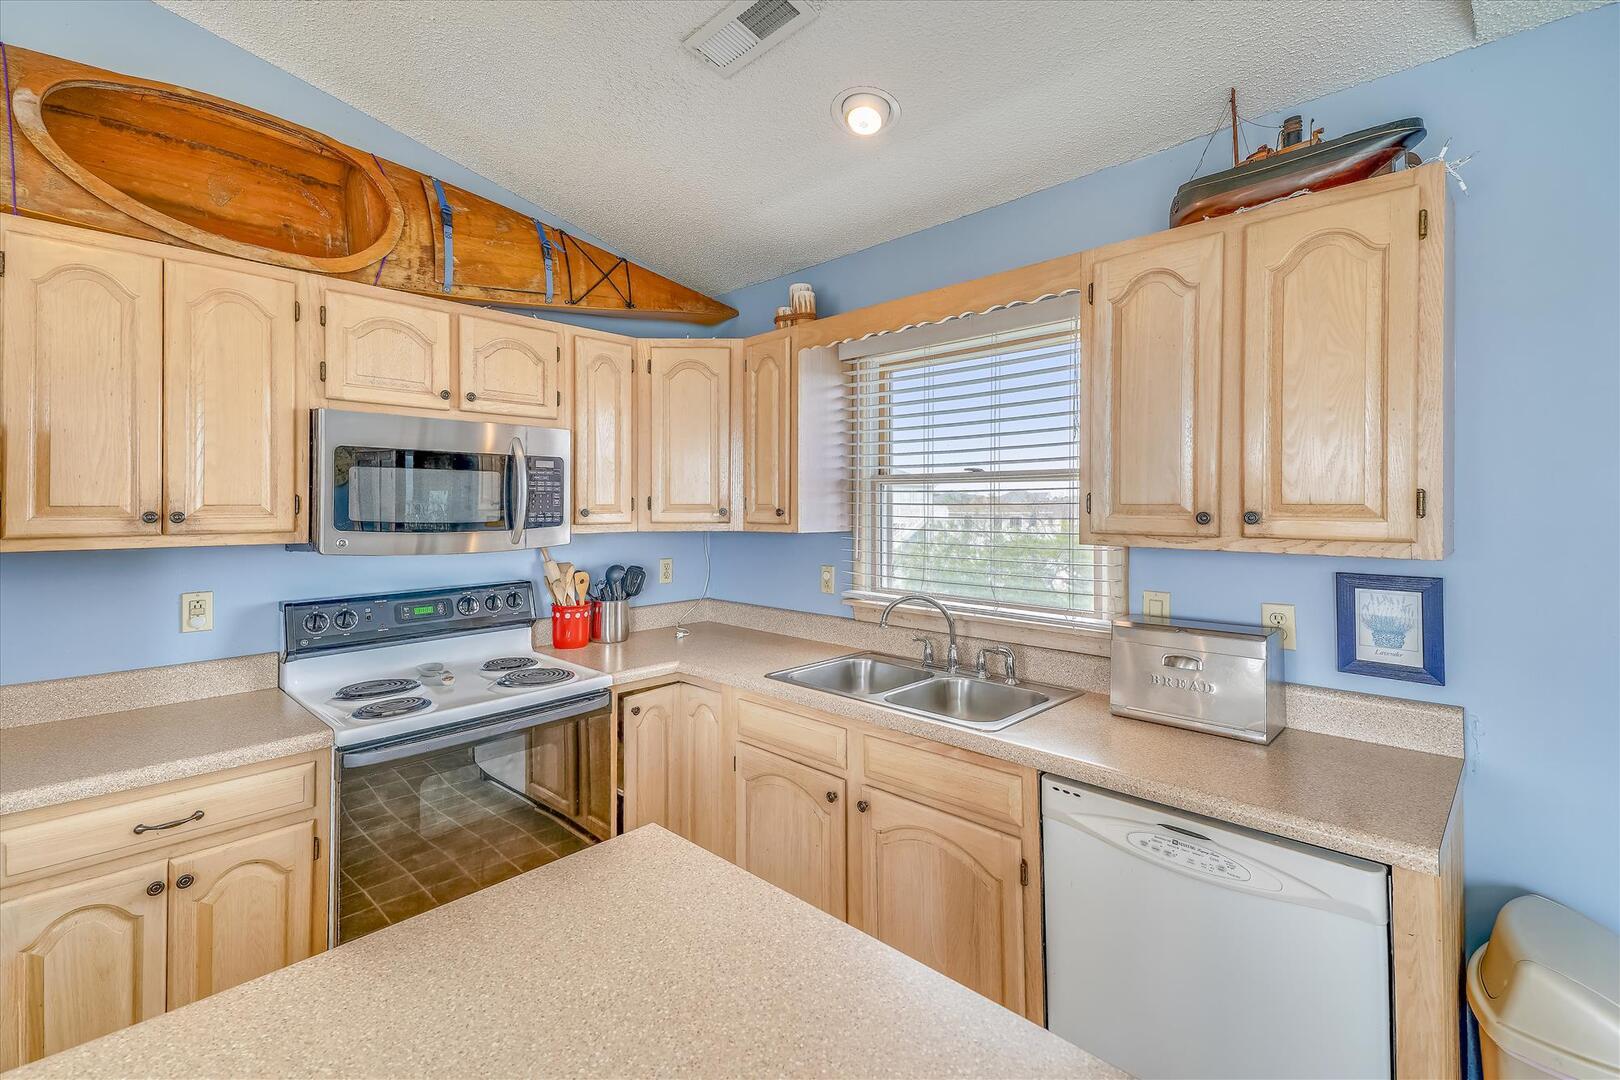 Upper/ Main Floor,Kitchen,